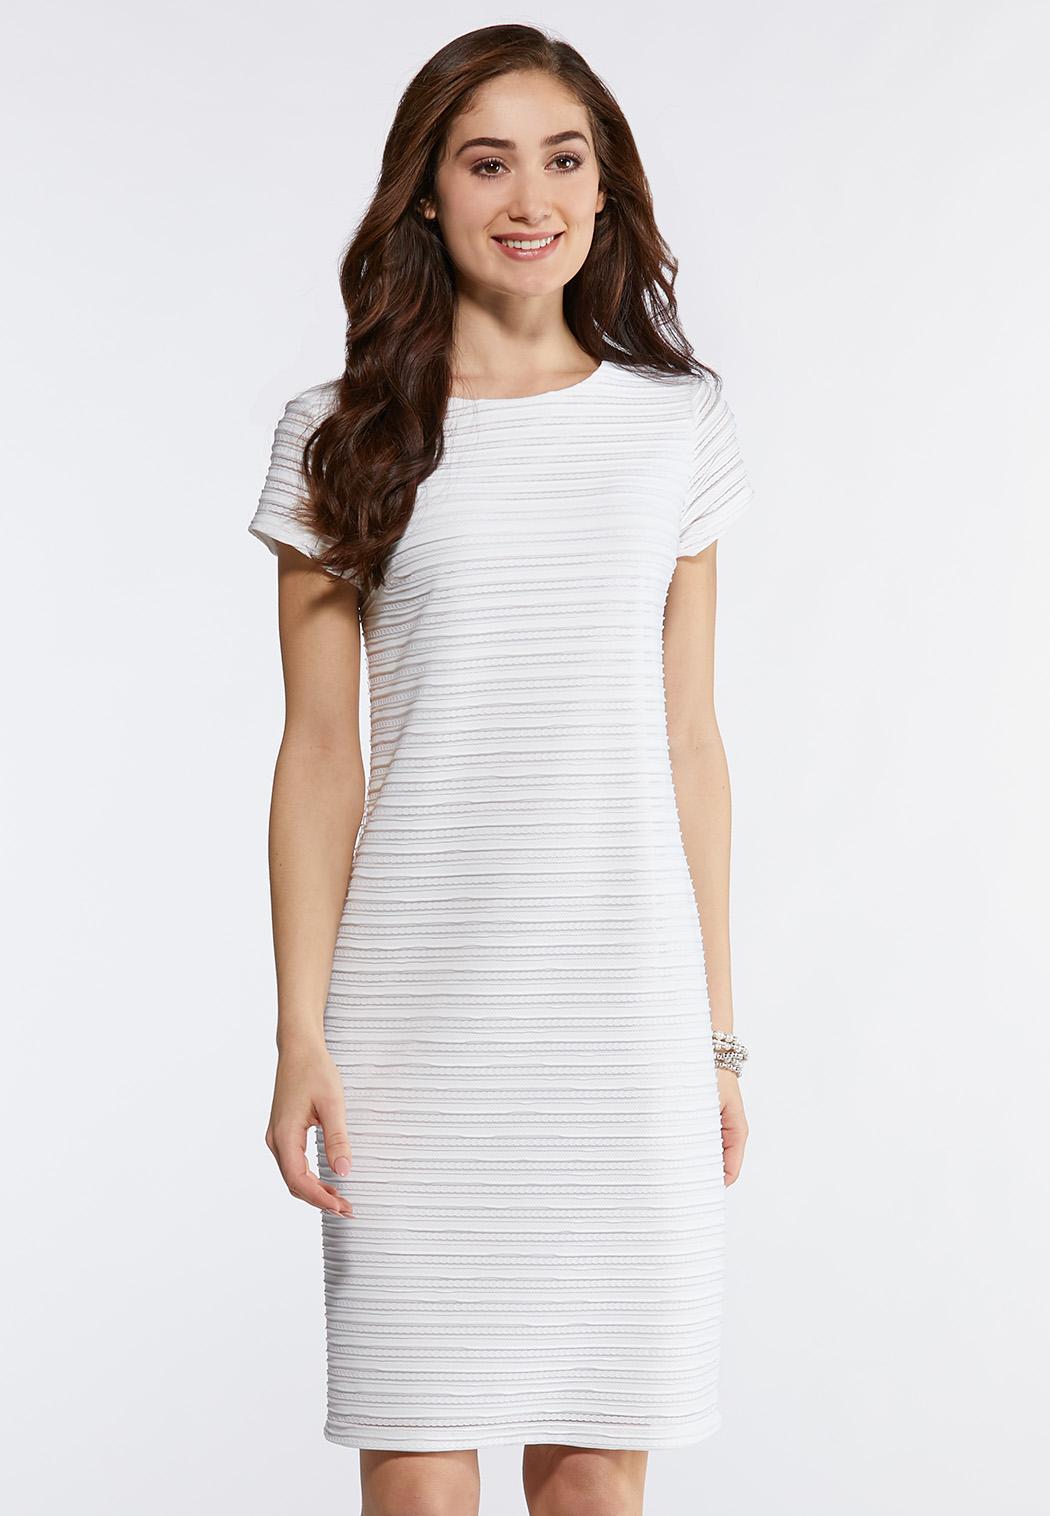 5e21d4ee1a00 Solid Textured Midi Dress Junior/Misses Cato Fashions